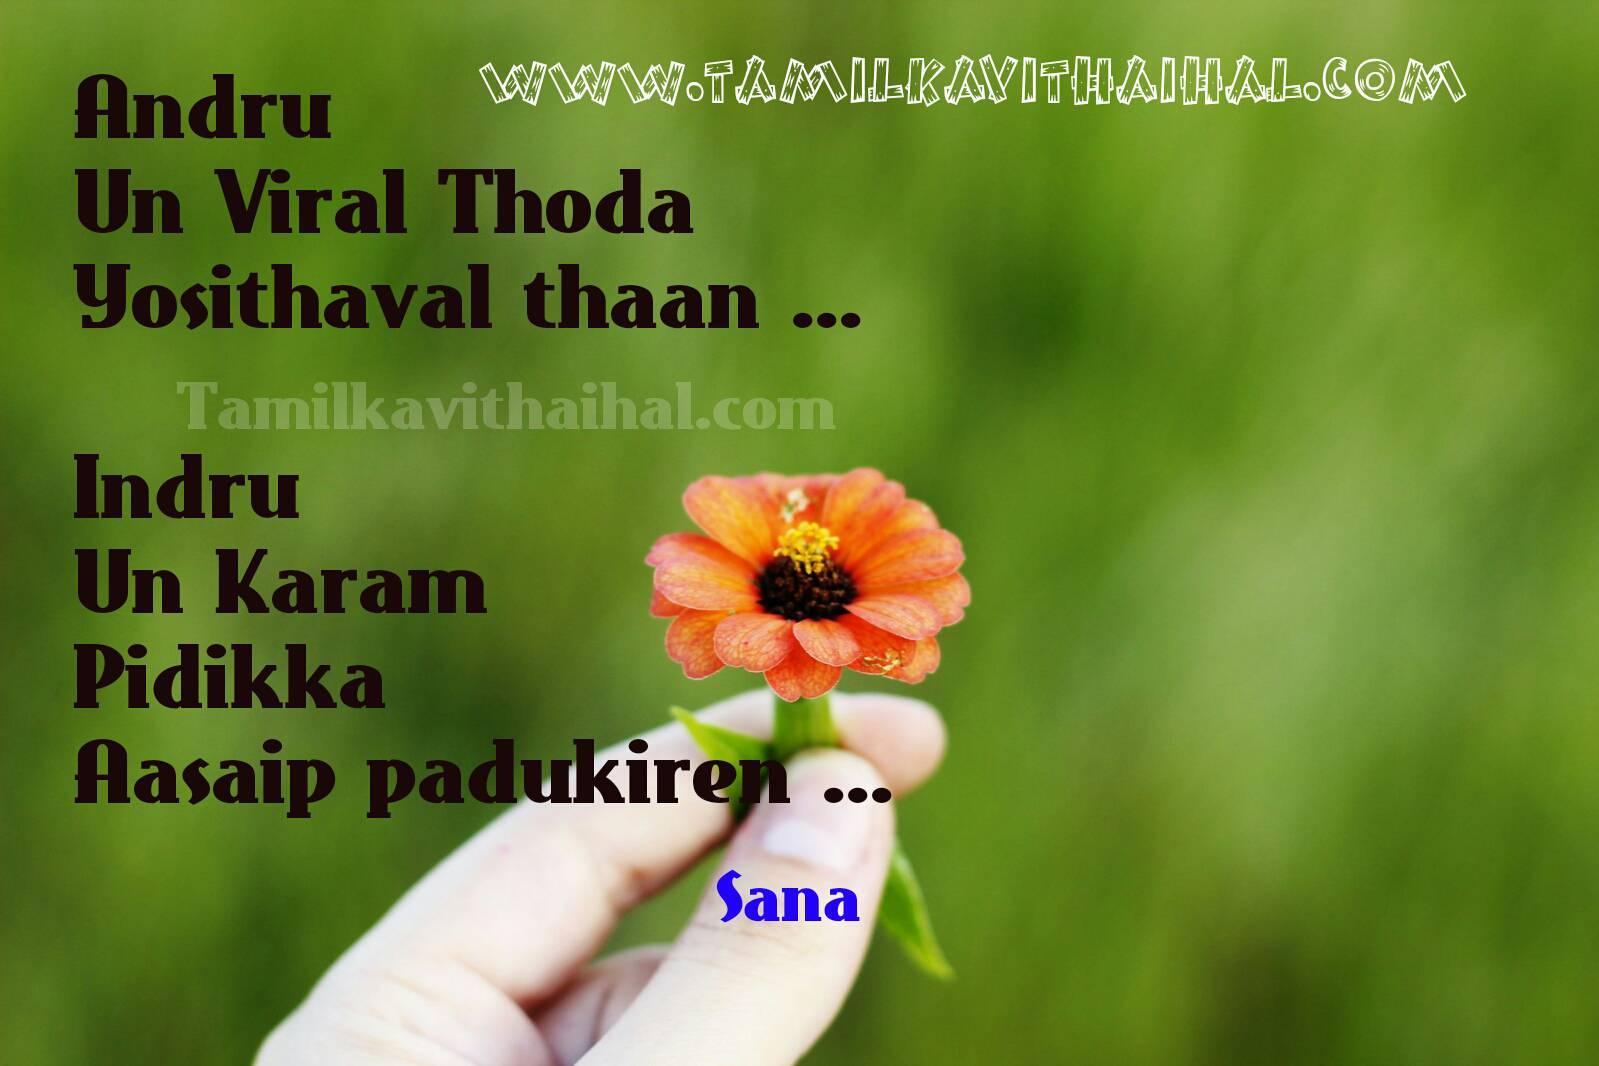 Awesome love proposal marraige quotes viral thoda yosithaval indru un karam pidika aasaipadukiran thanglish kavithai